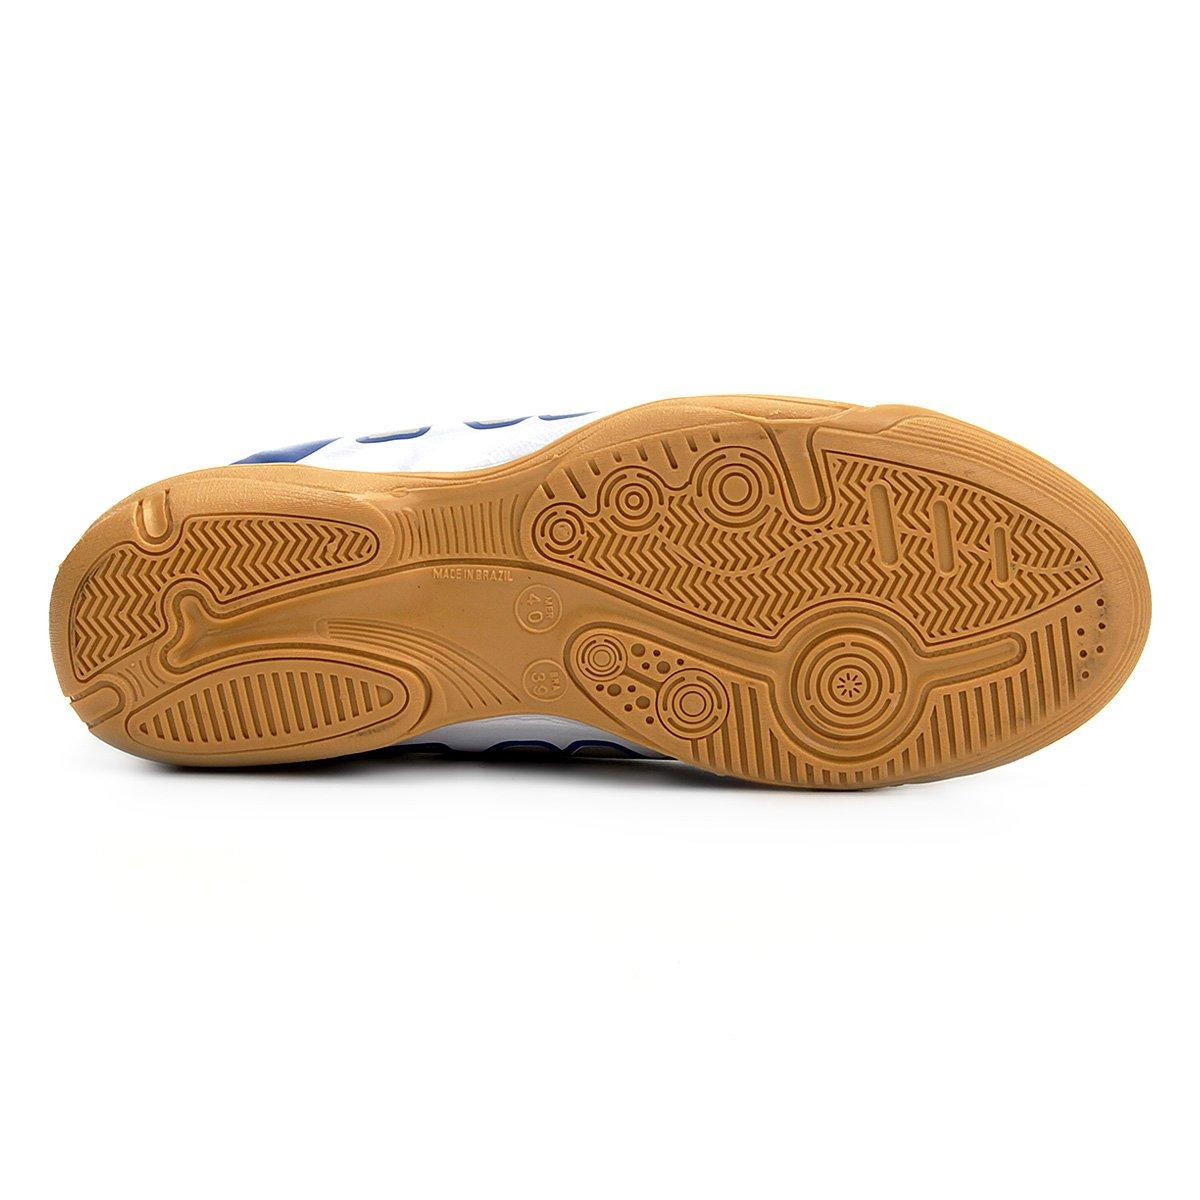 fb6edbd5aa Chuteira Futsal Kappa Torpedo - Tam  44 - Shopping TudoAzul